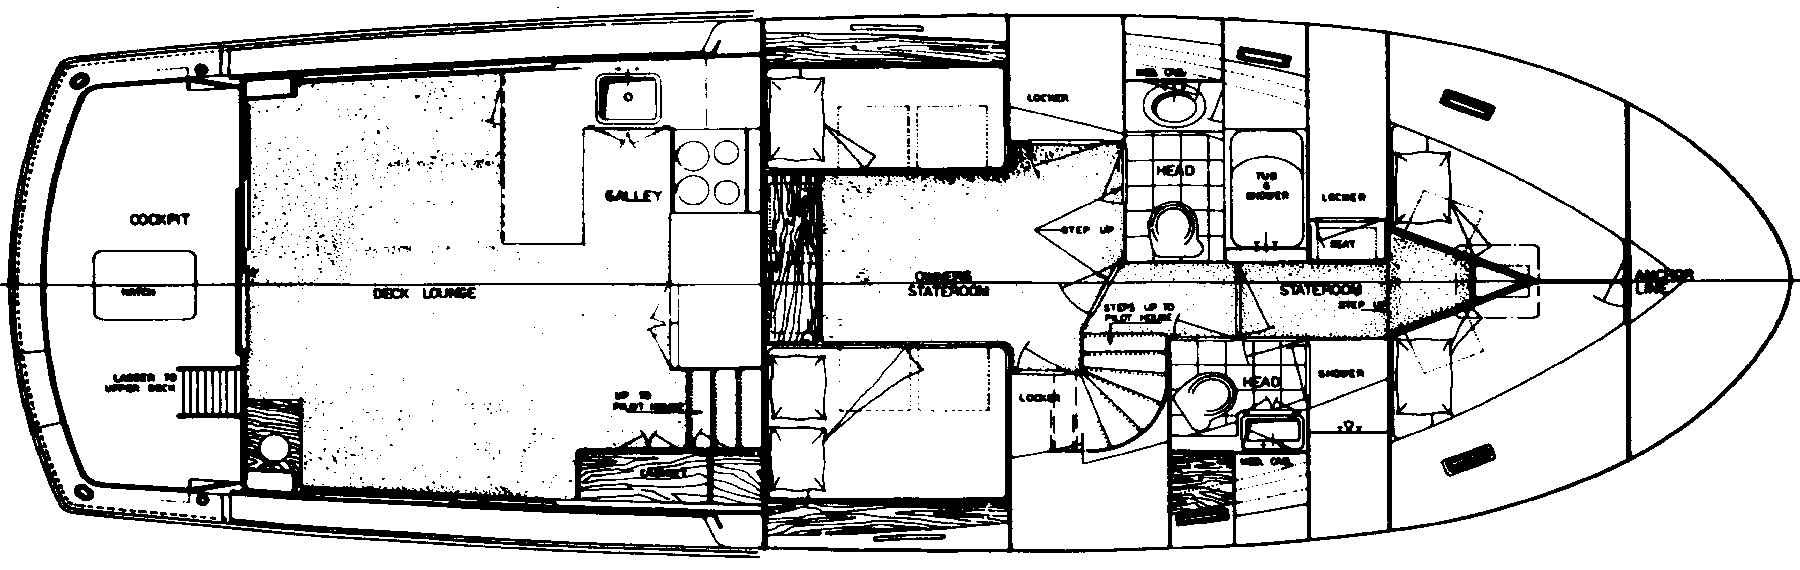 48 LRC Floor Plan 2